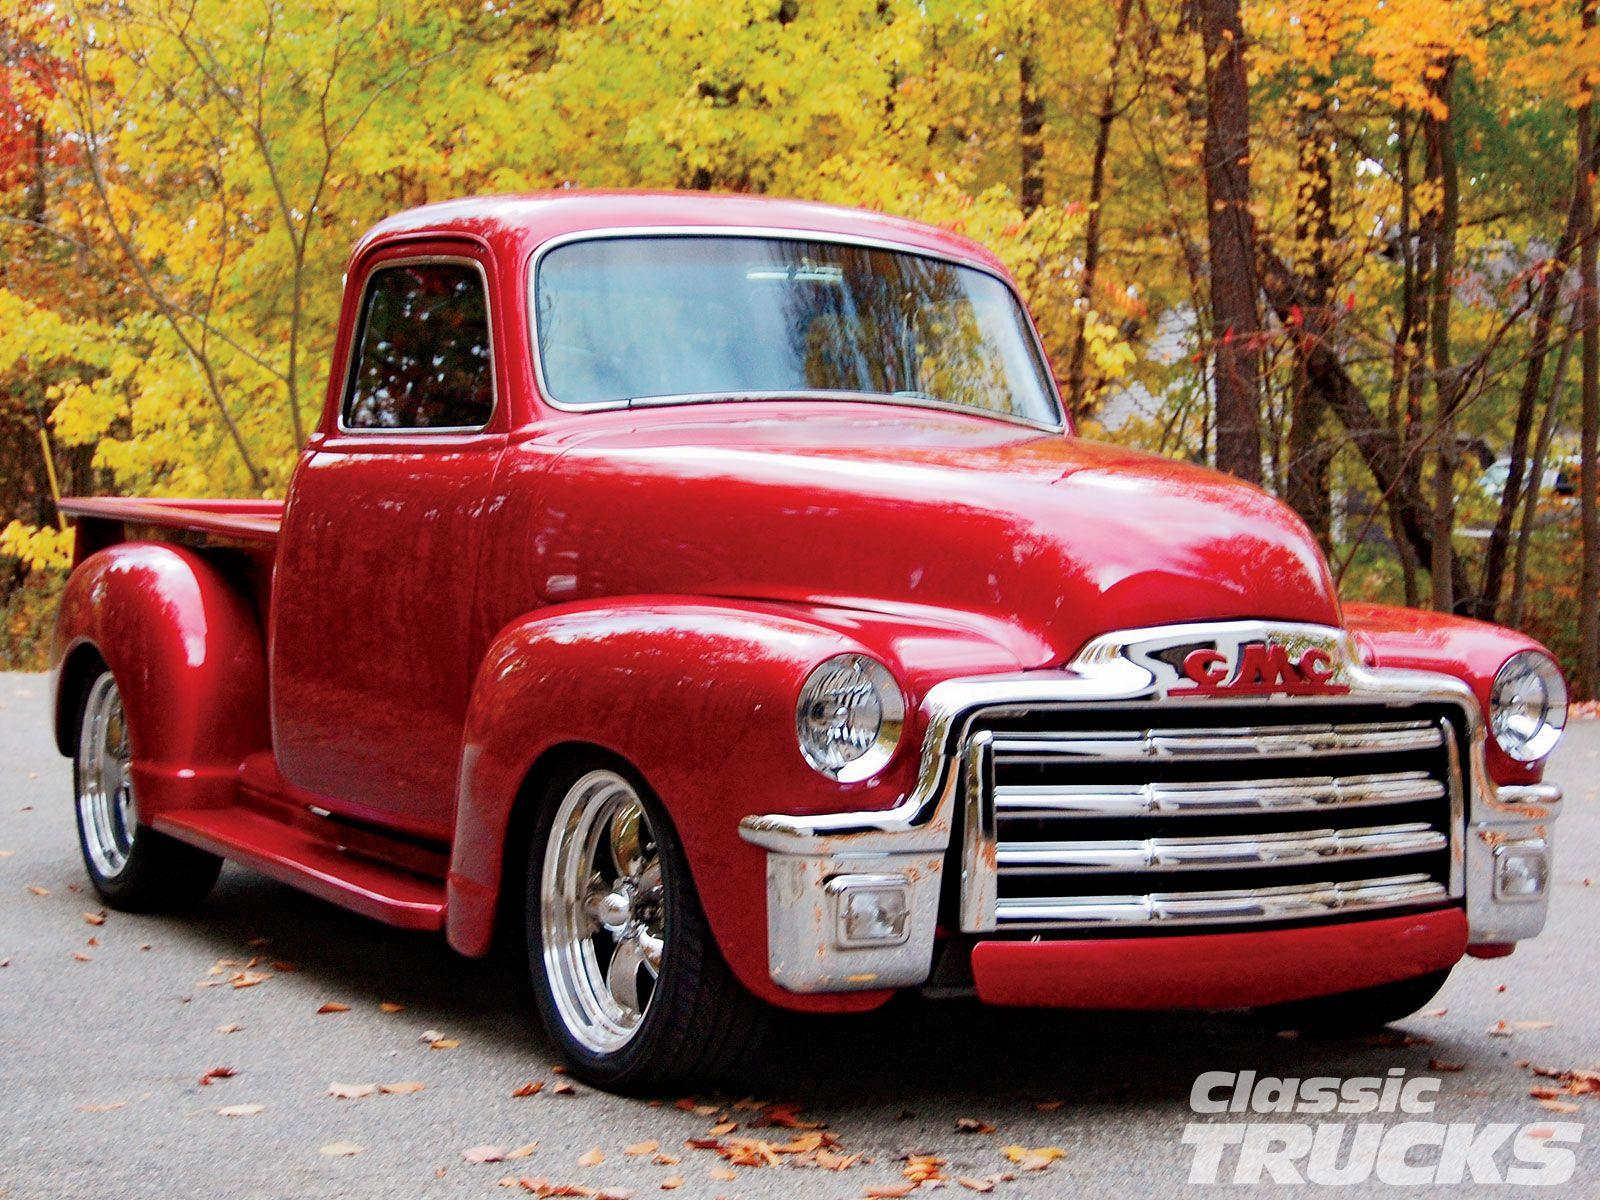 1955 GMC Pickup | 1955 Gmc Truck Front | CHEVY/ GMC TRUCKS ...